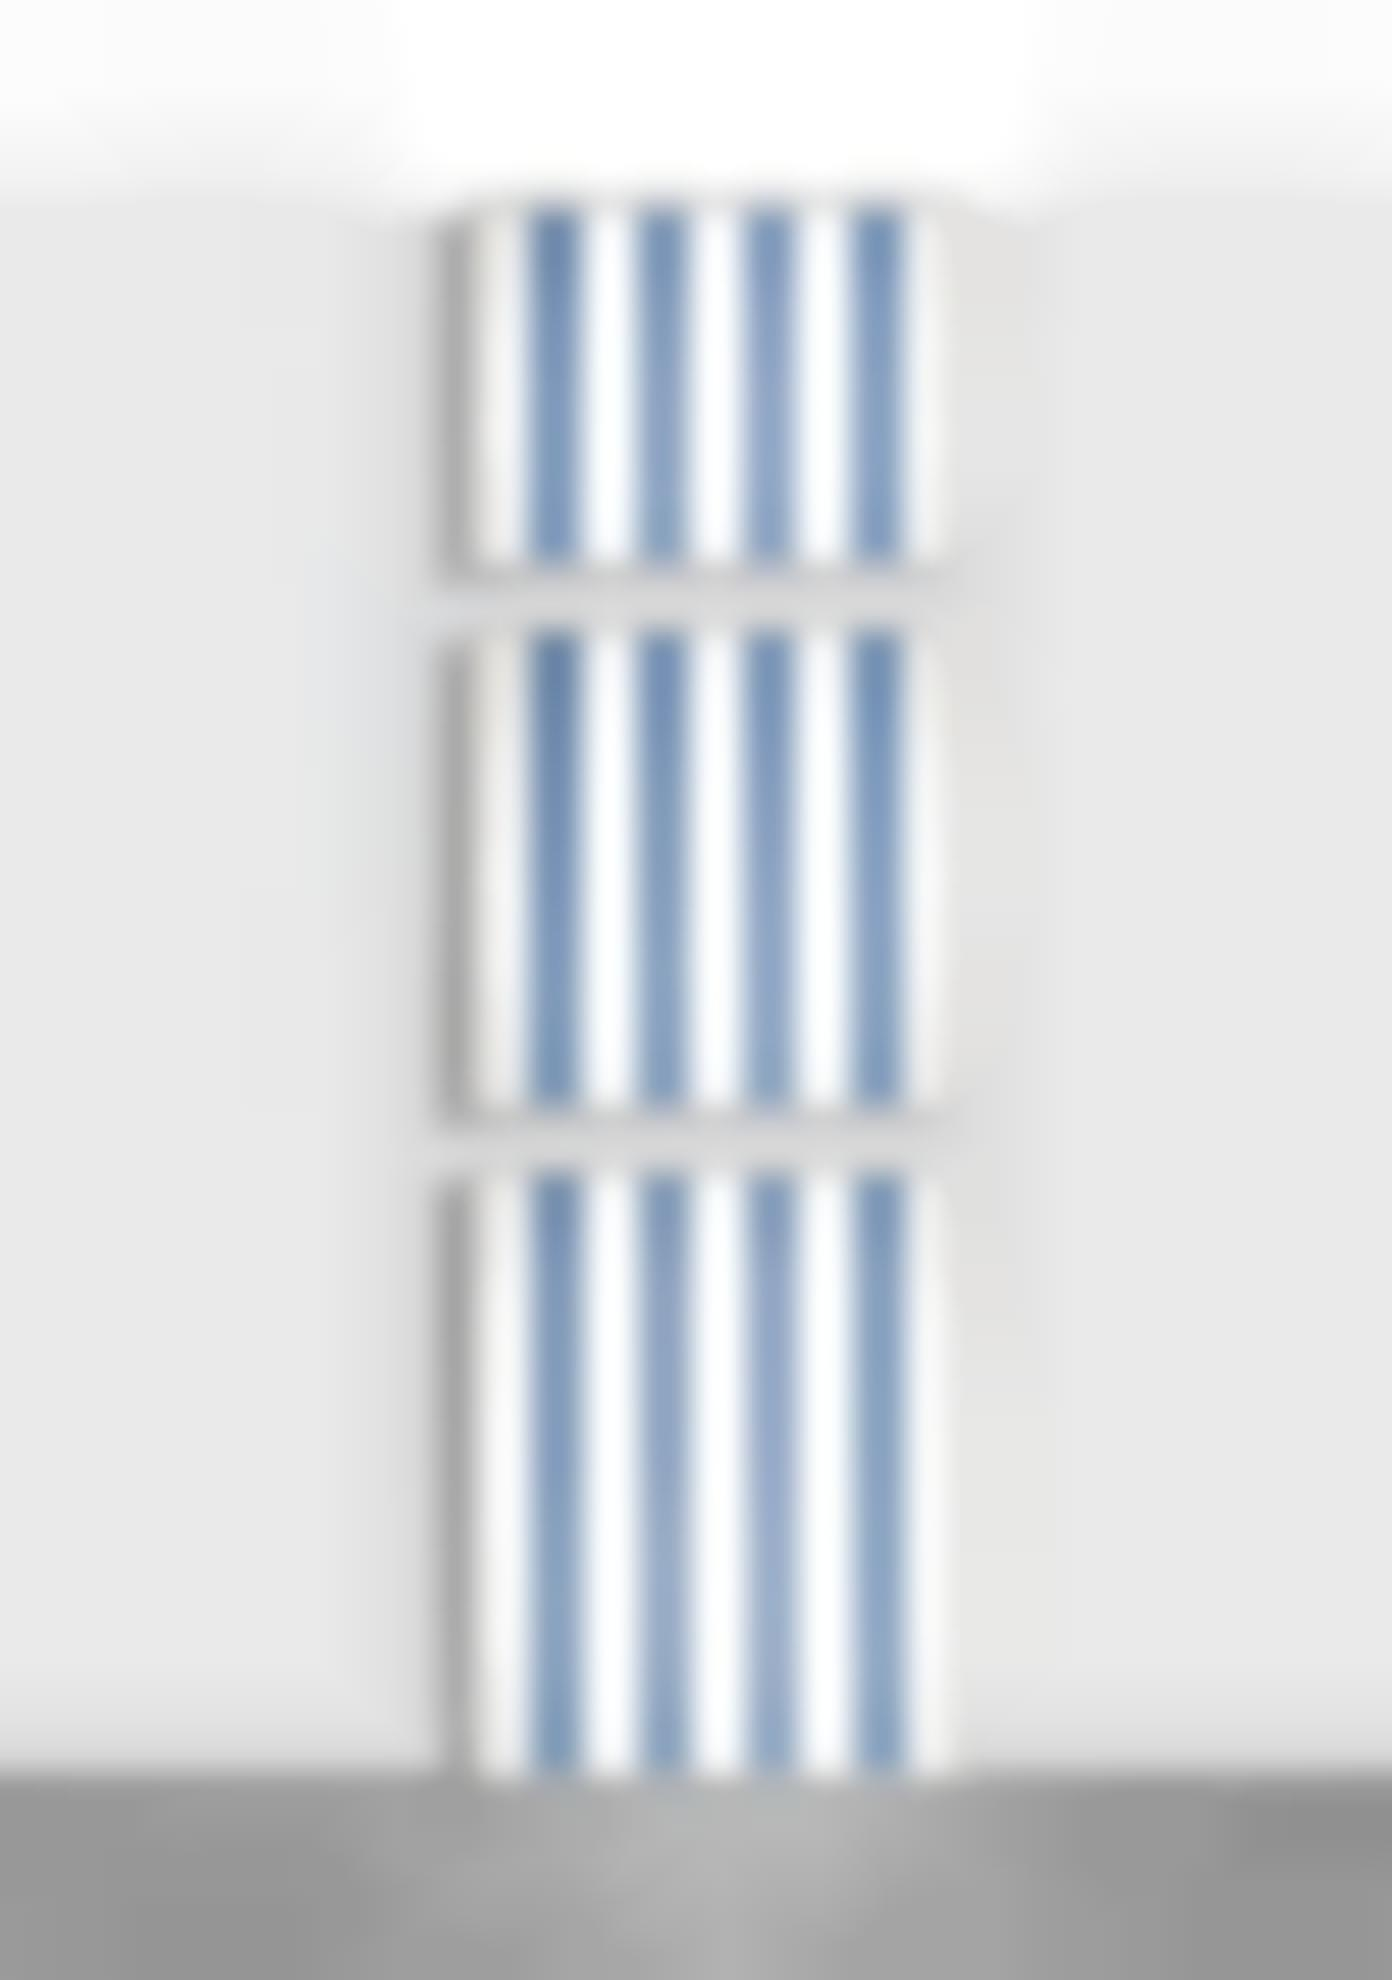 Daniel Buren-Three Light Boxes For One Wall-1989